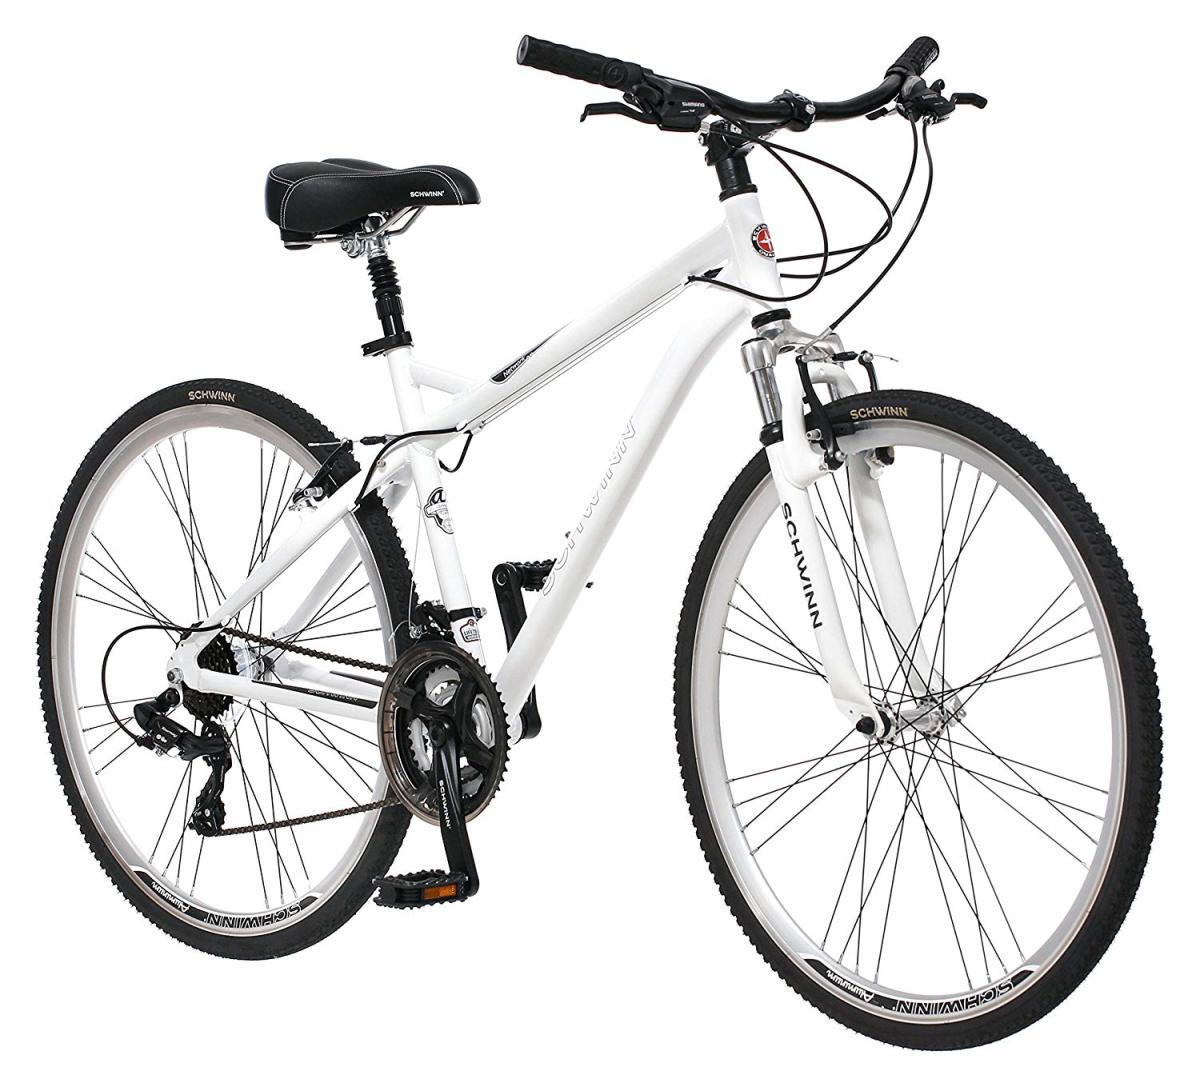 Top 5 Cheap City Bikes For 2019 Good Urban Environment Rides